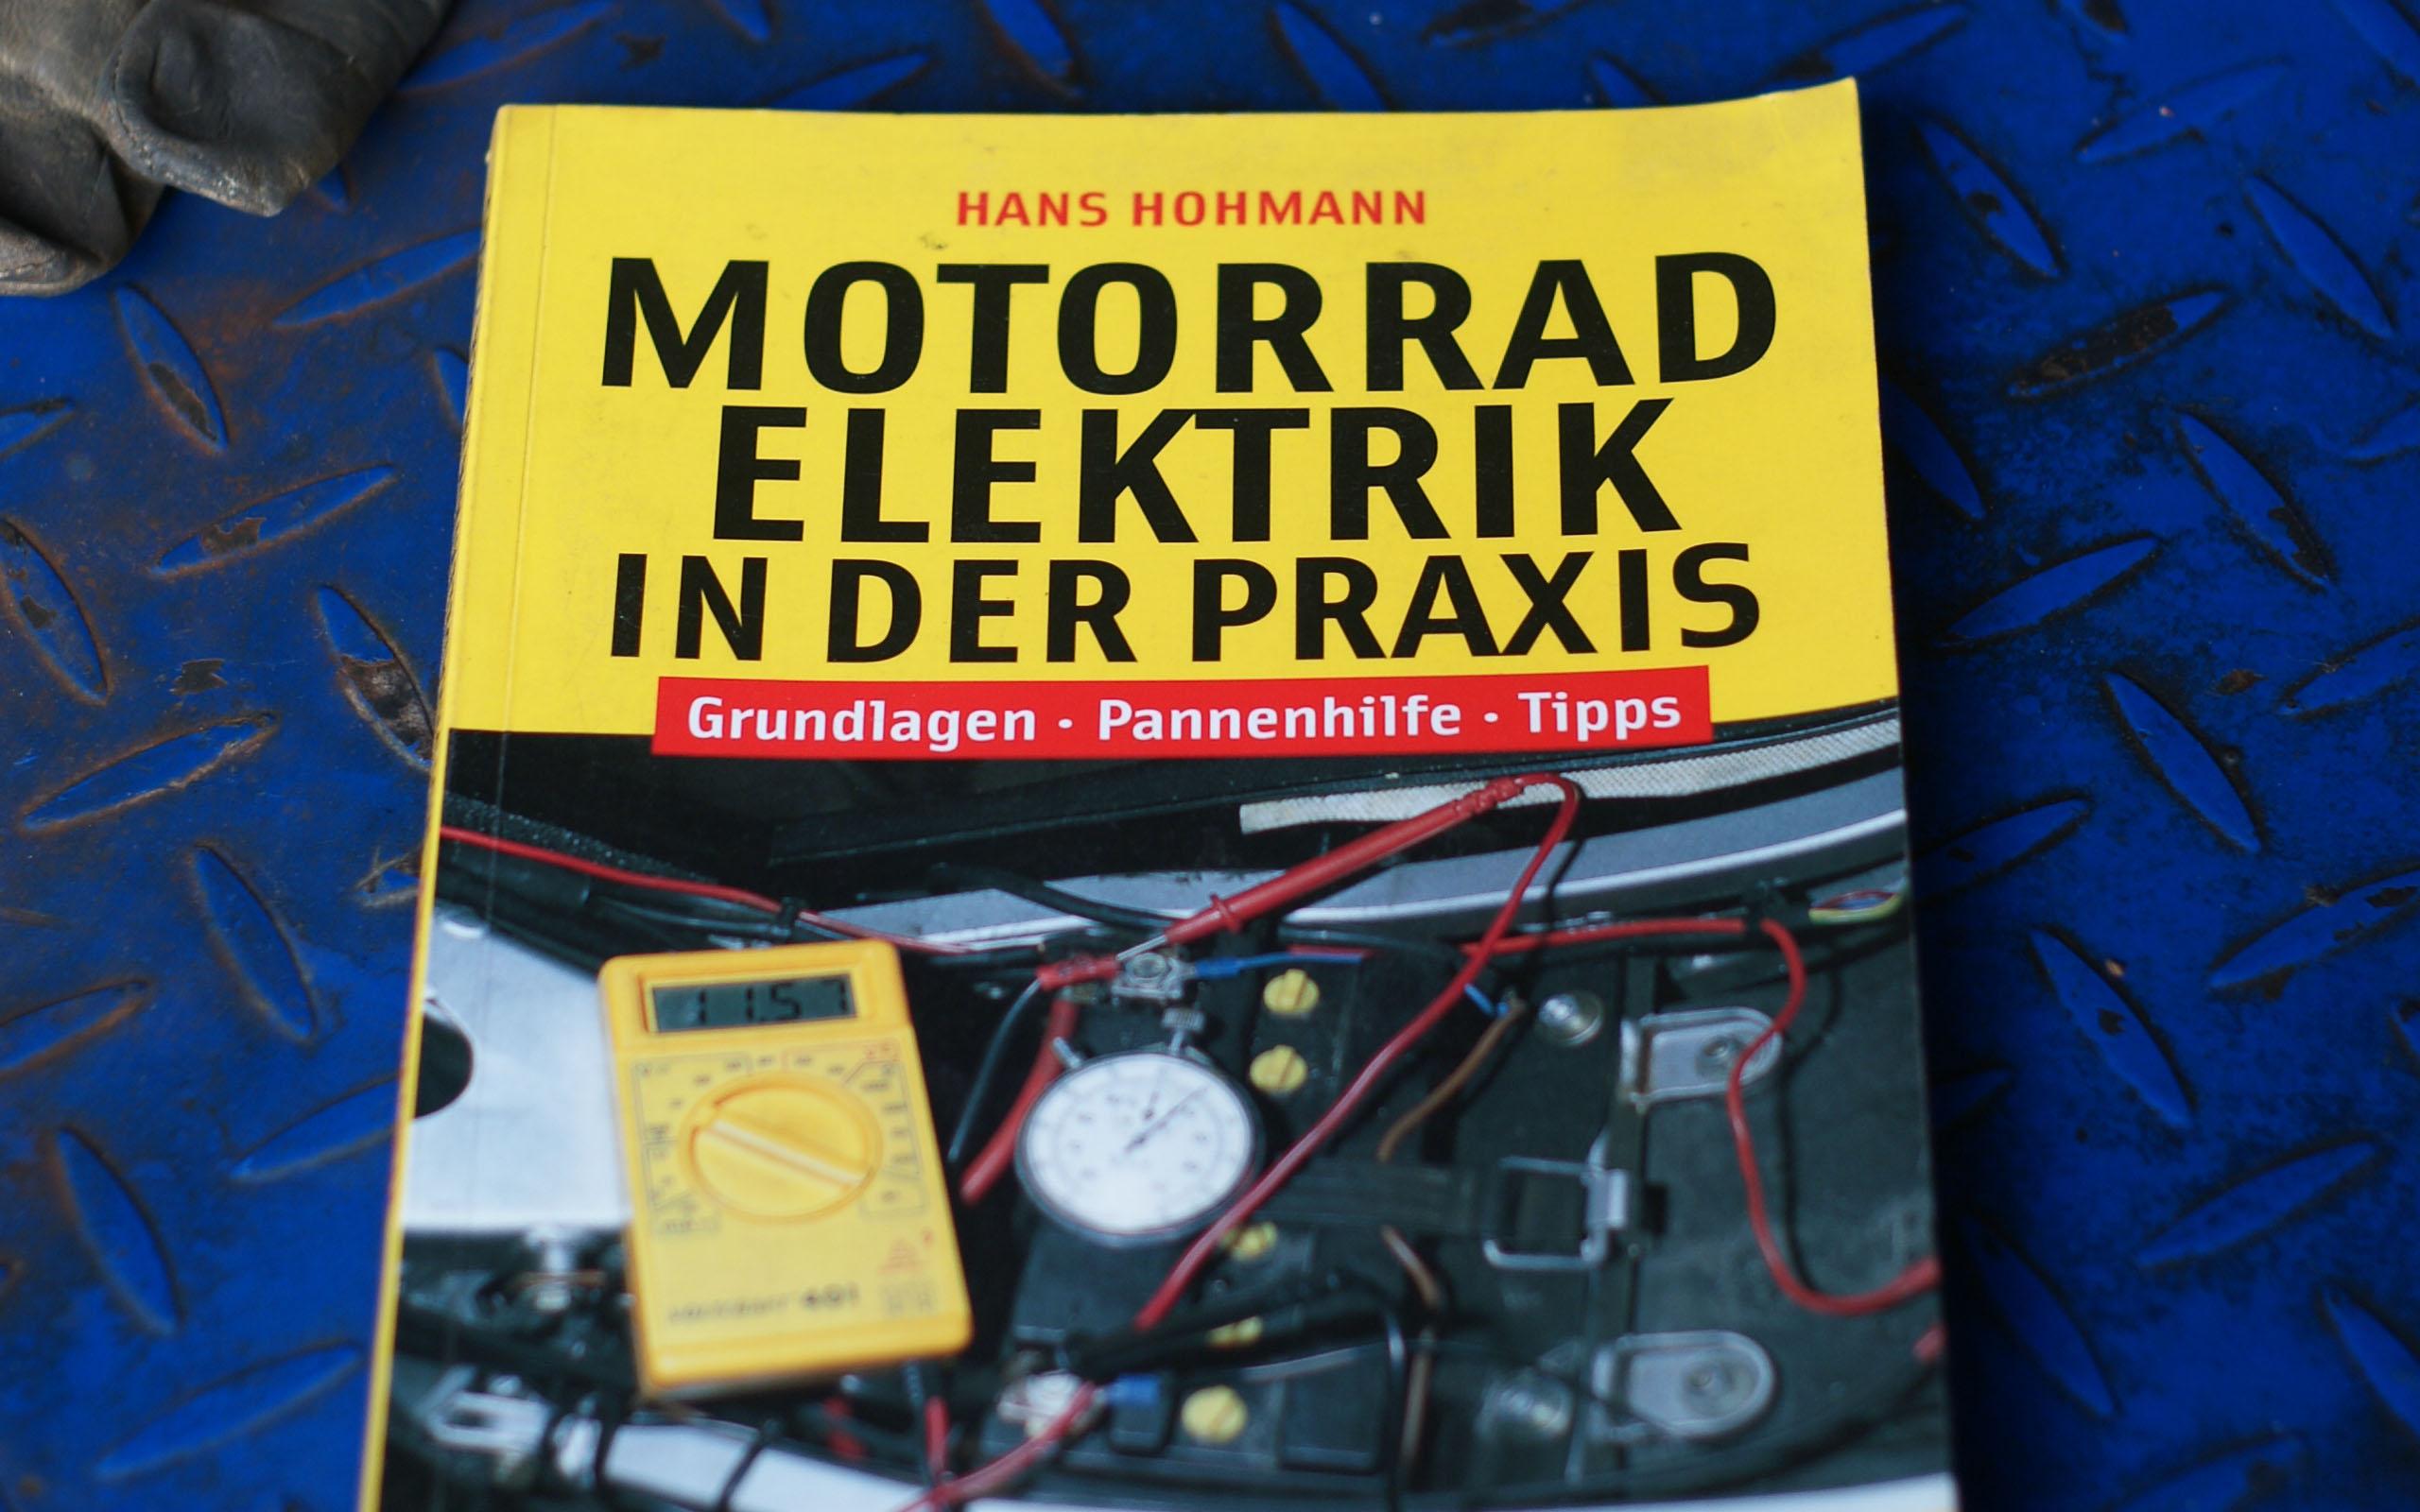 Buchtipp: Motorrad Elektrik in der Praxis